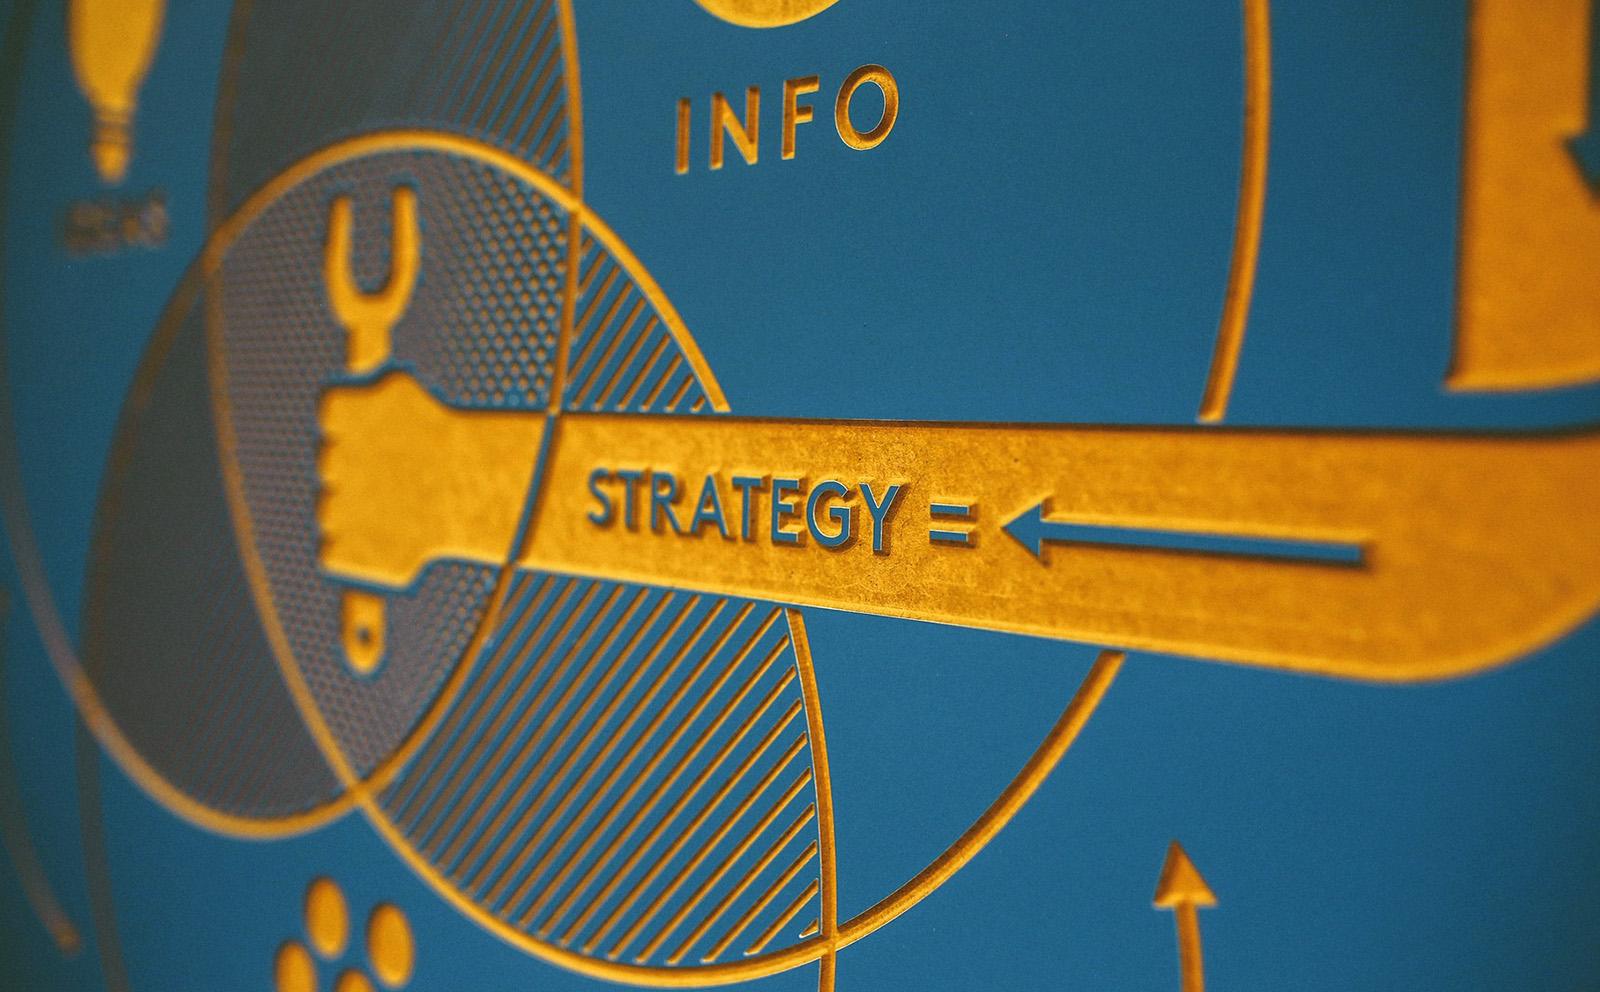 Modern security strategies key to support remote workforce demands